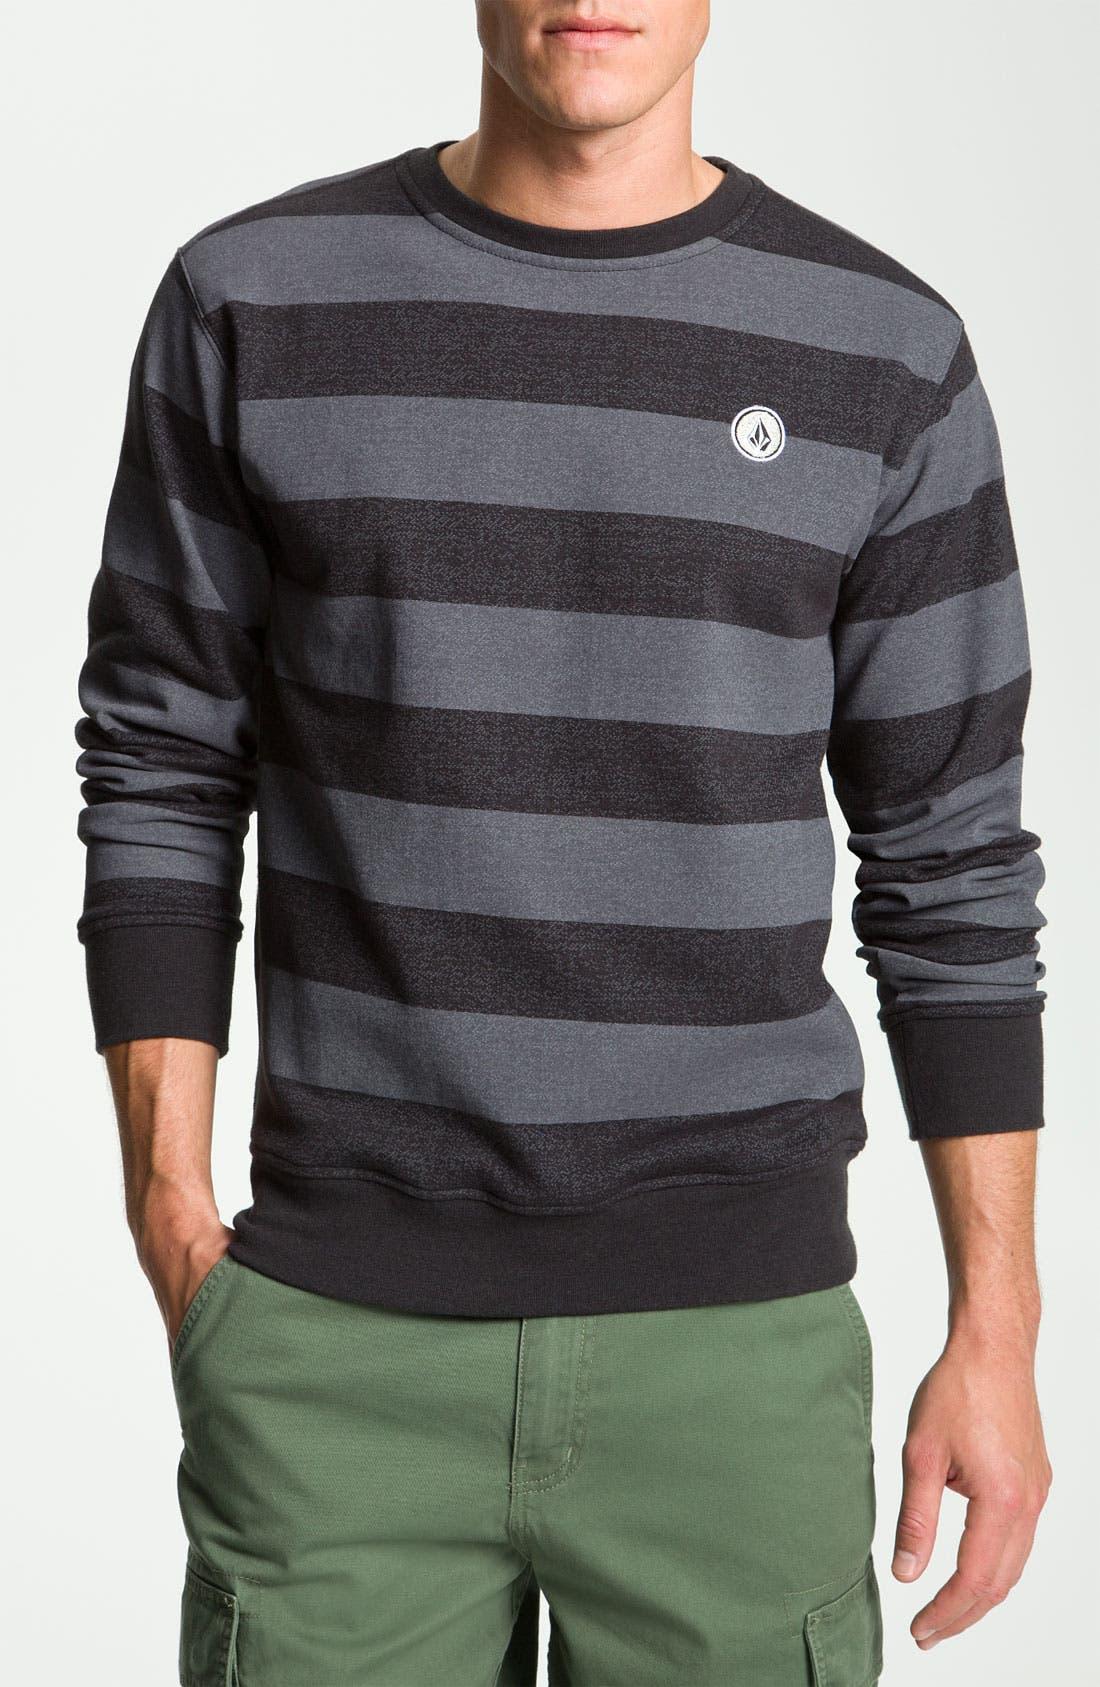 Main Image - Volcom 'Eds' Stripe Crewneck Sweatshirt